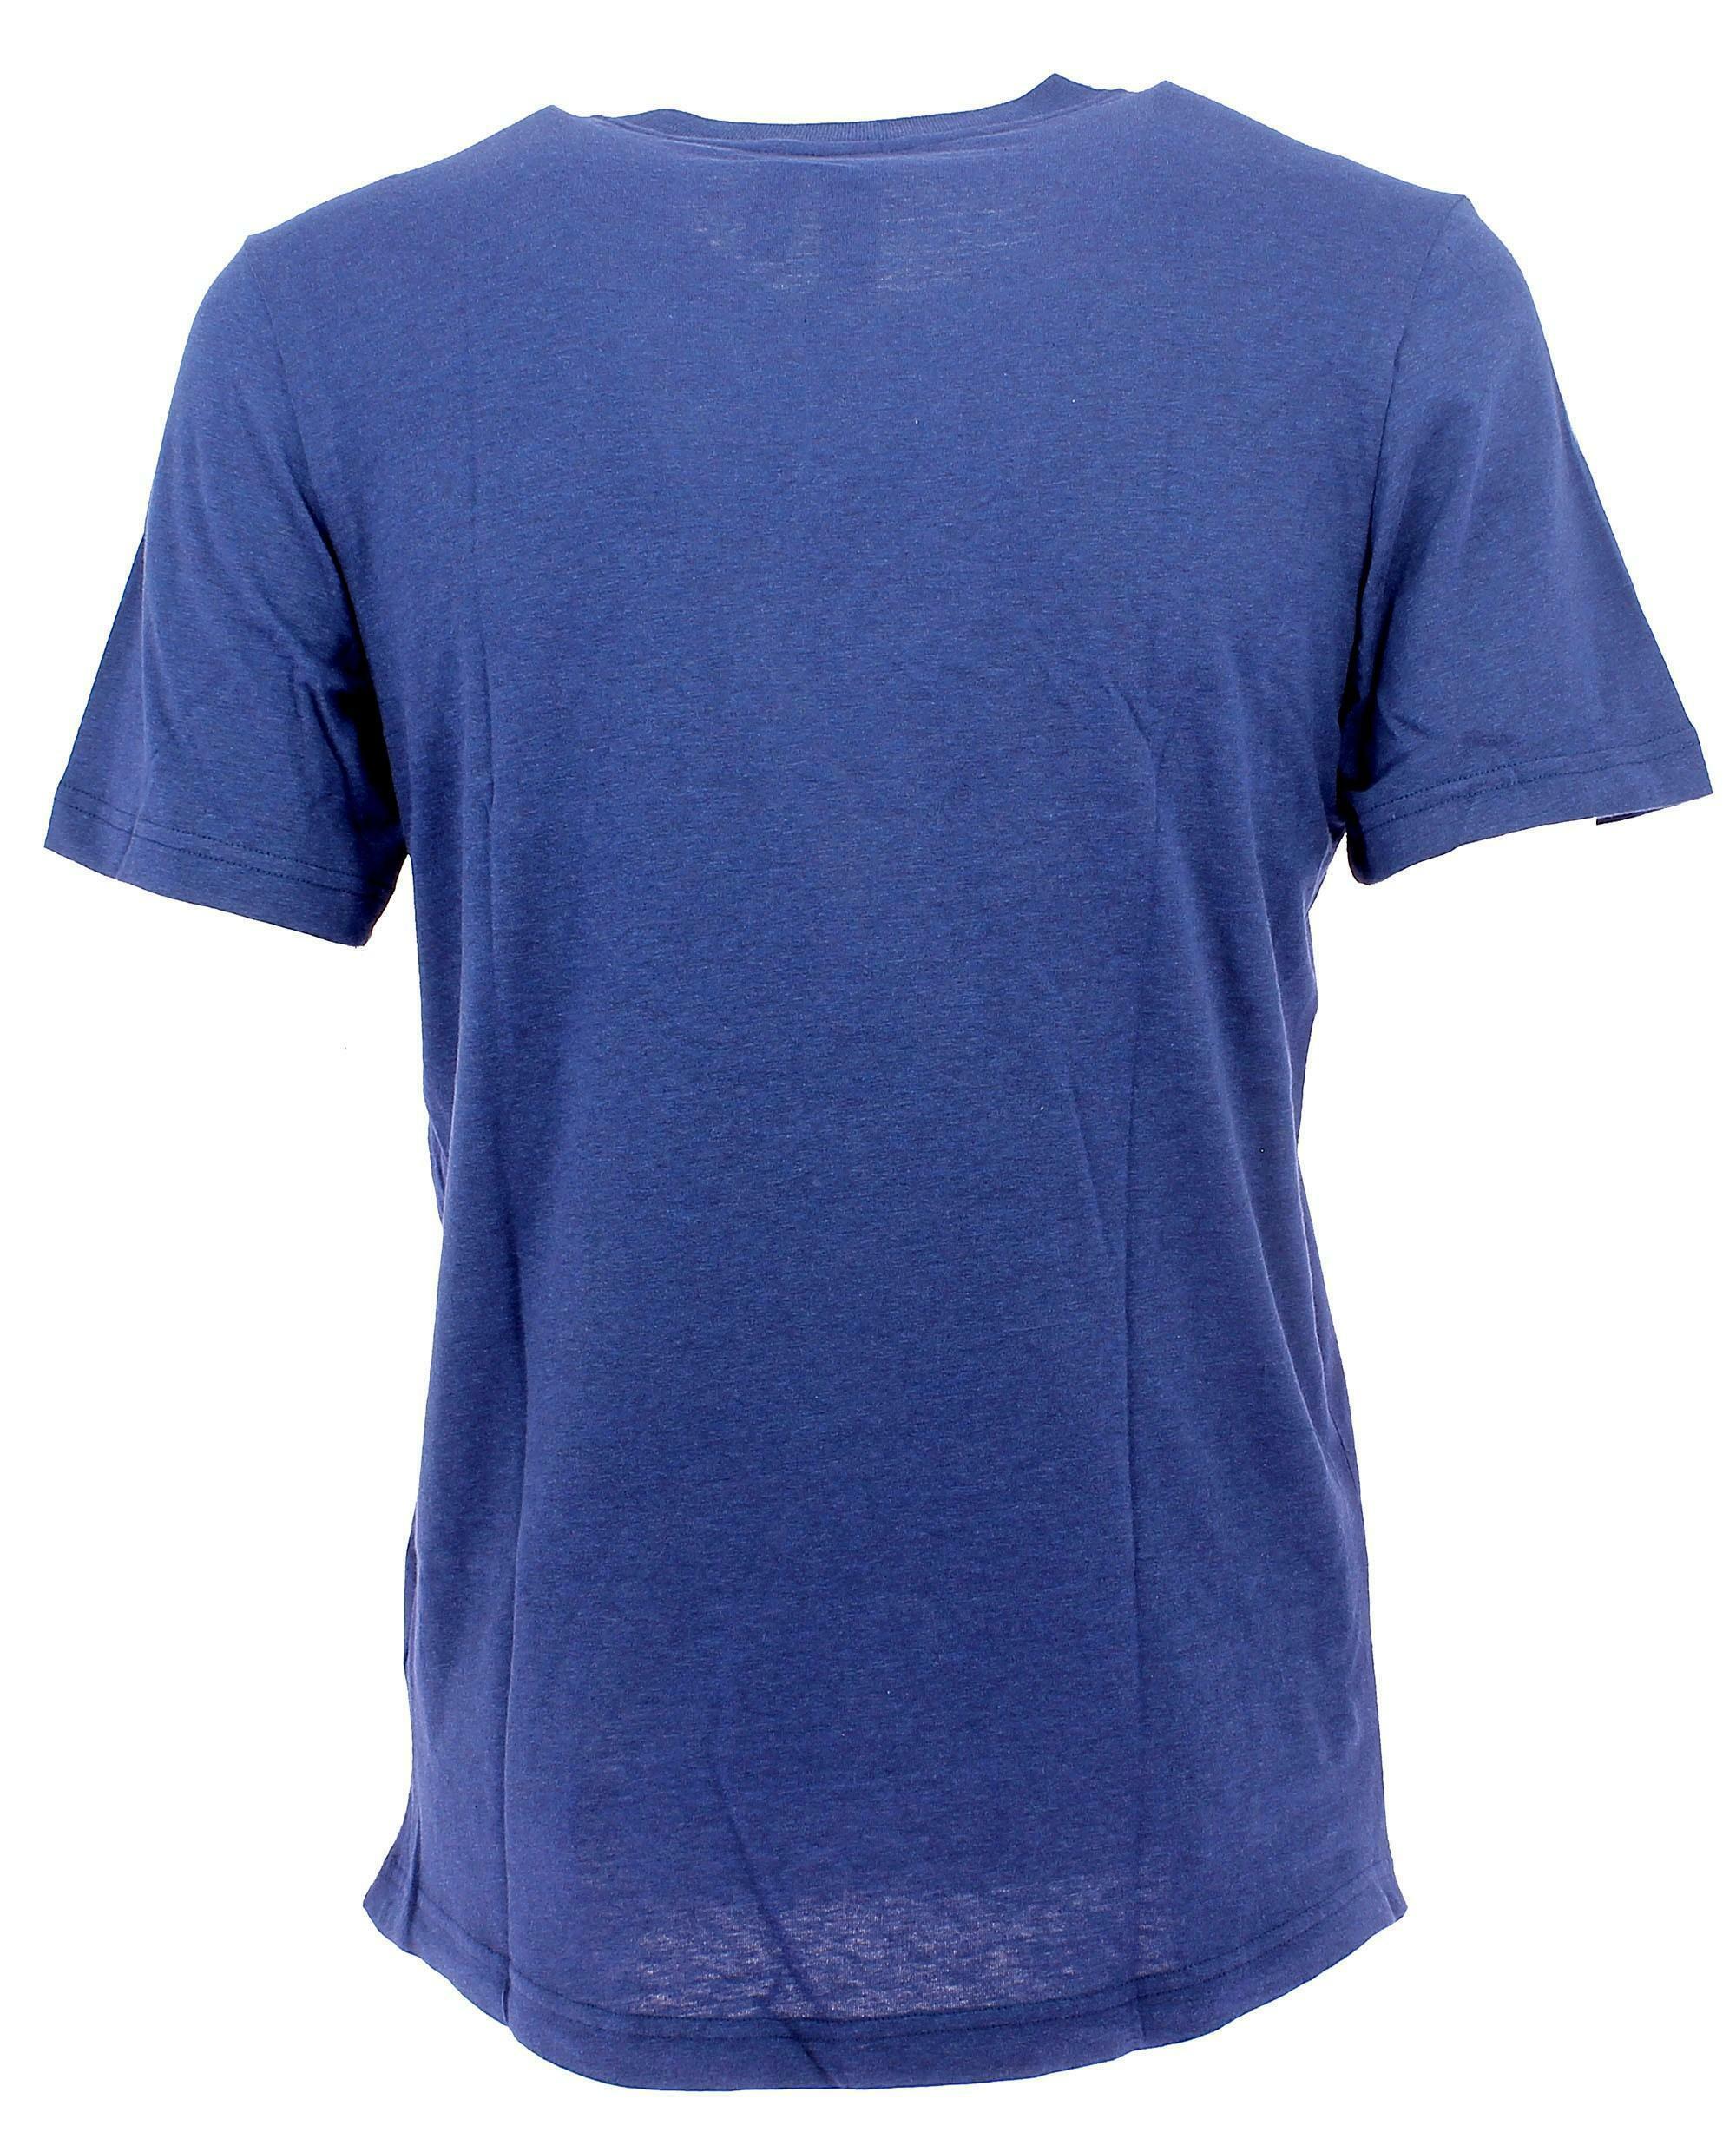 adidas adidas sid logo t-shirt uomo blu dm4062